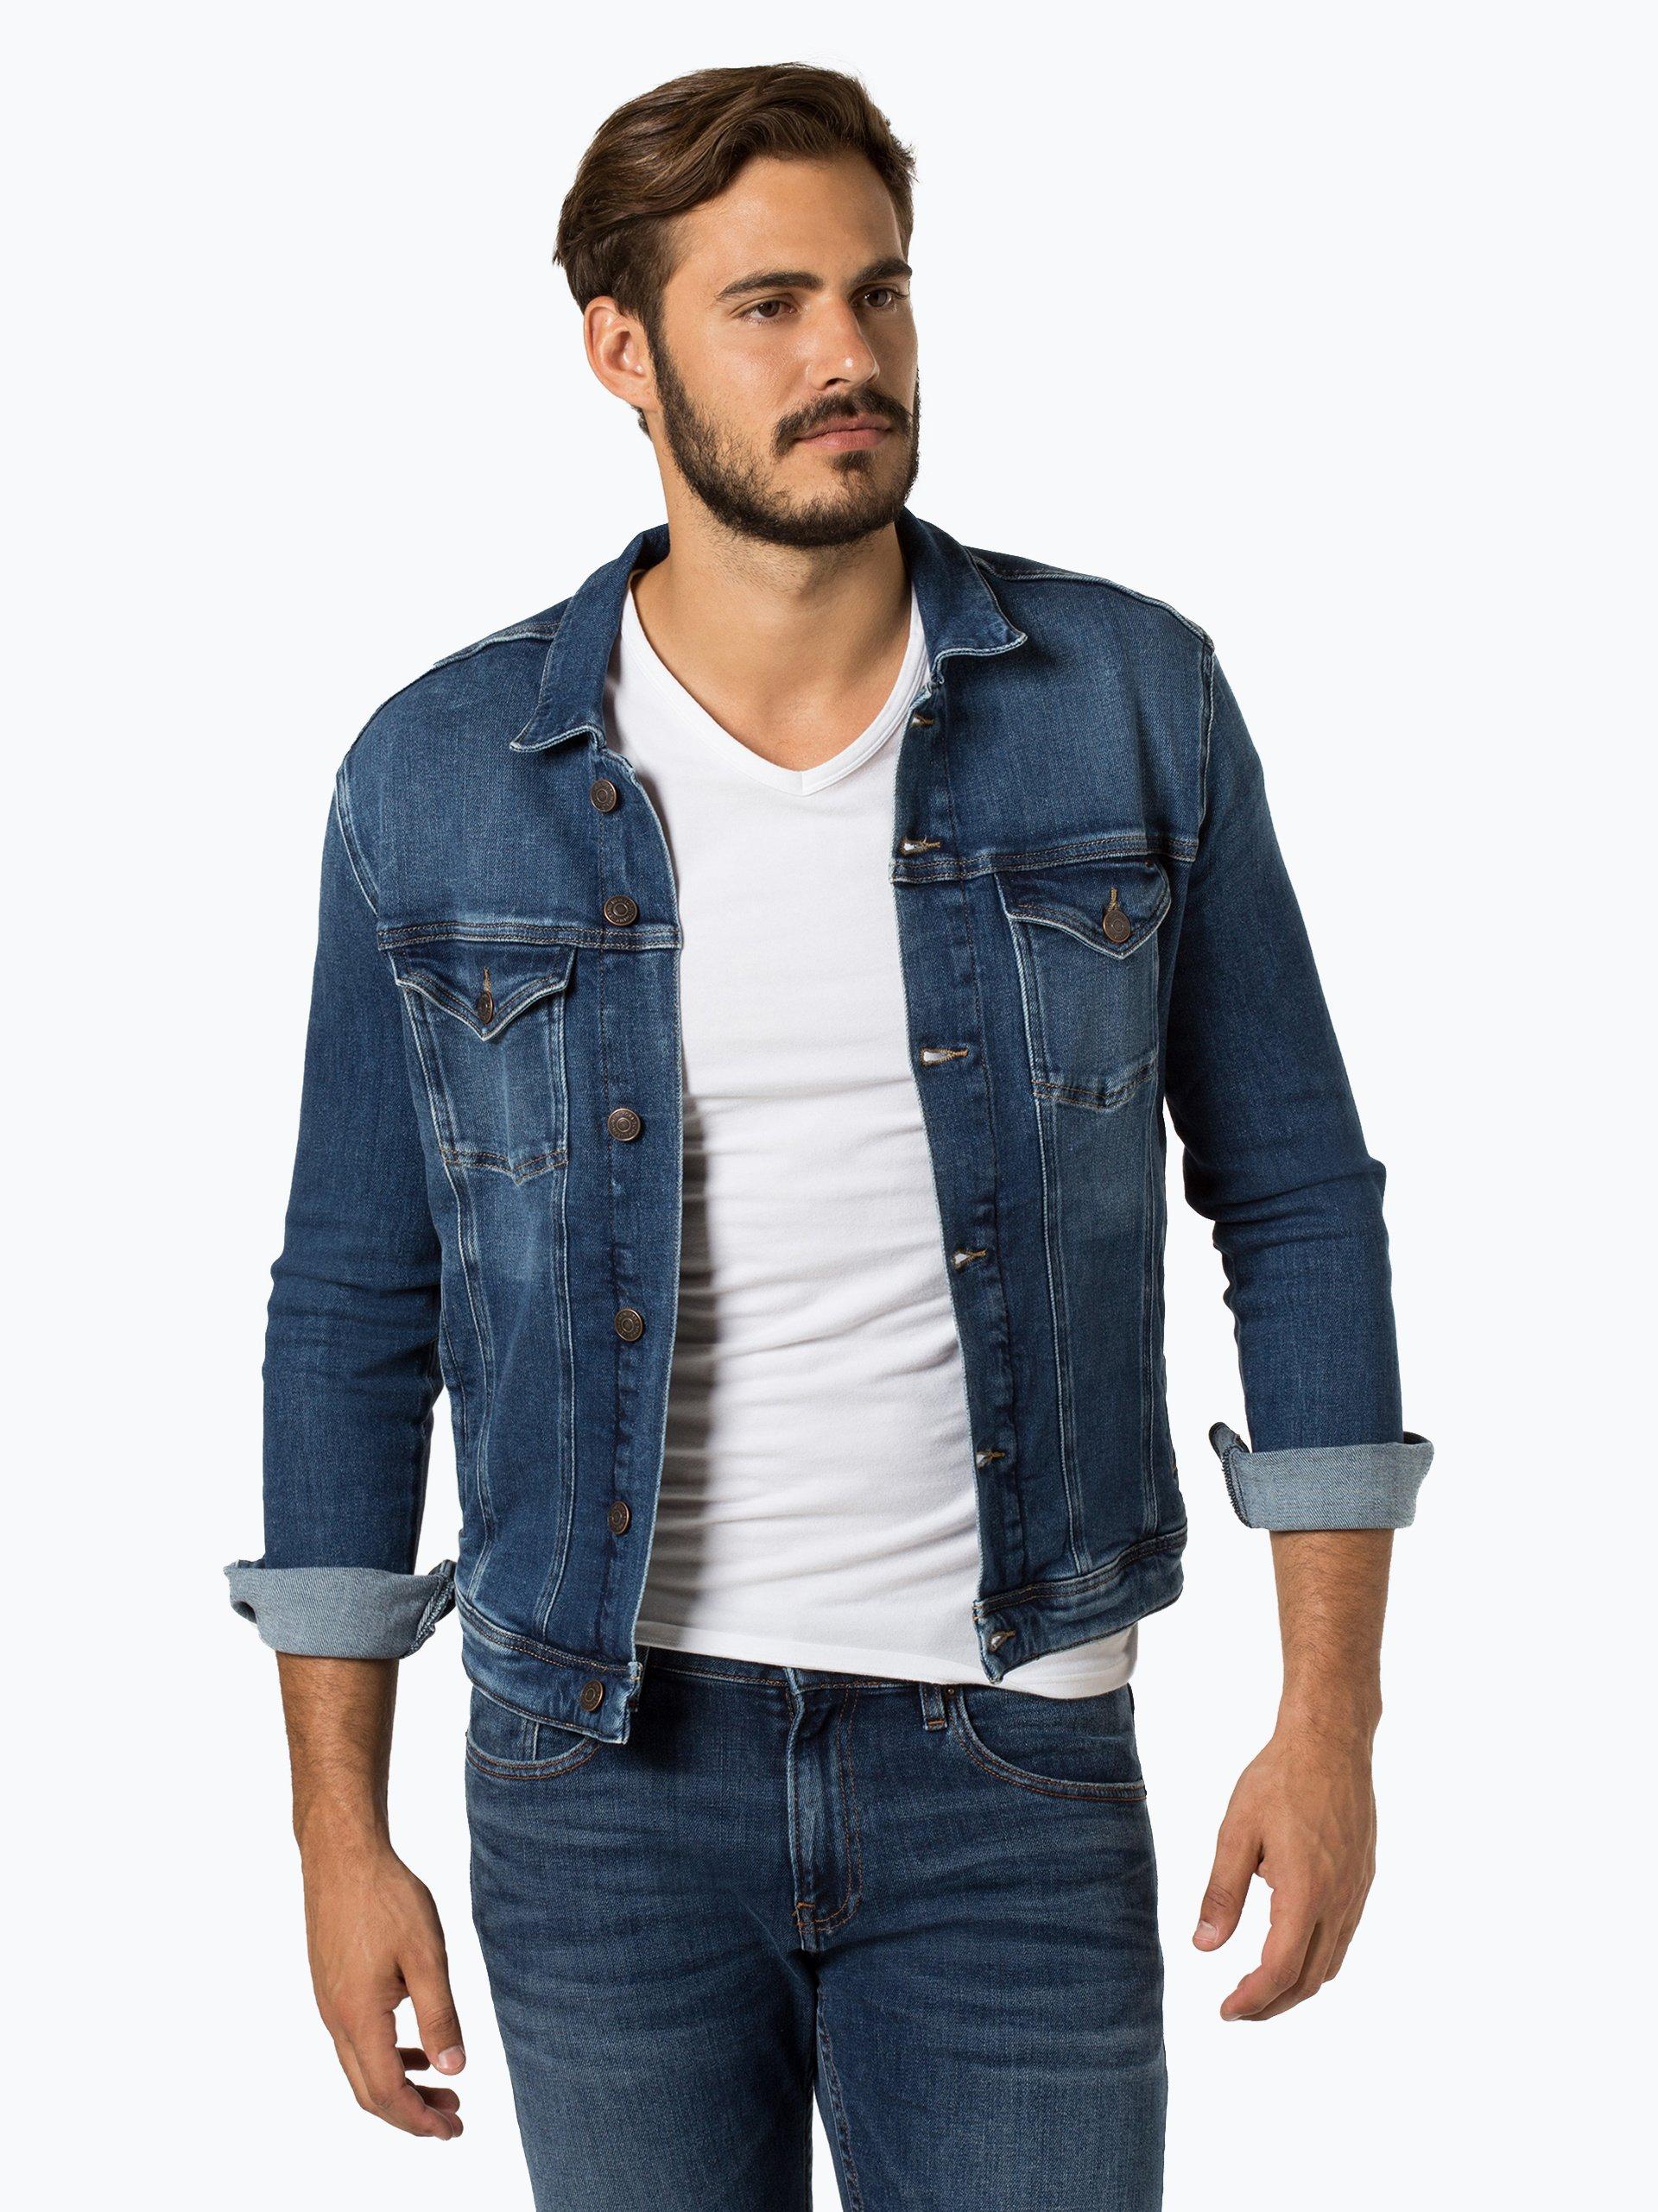 tommy jeans herren jeansjacke online kaufen peek und. Black Bedroom Furniture Sets. Home Design Ideas